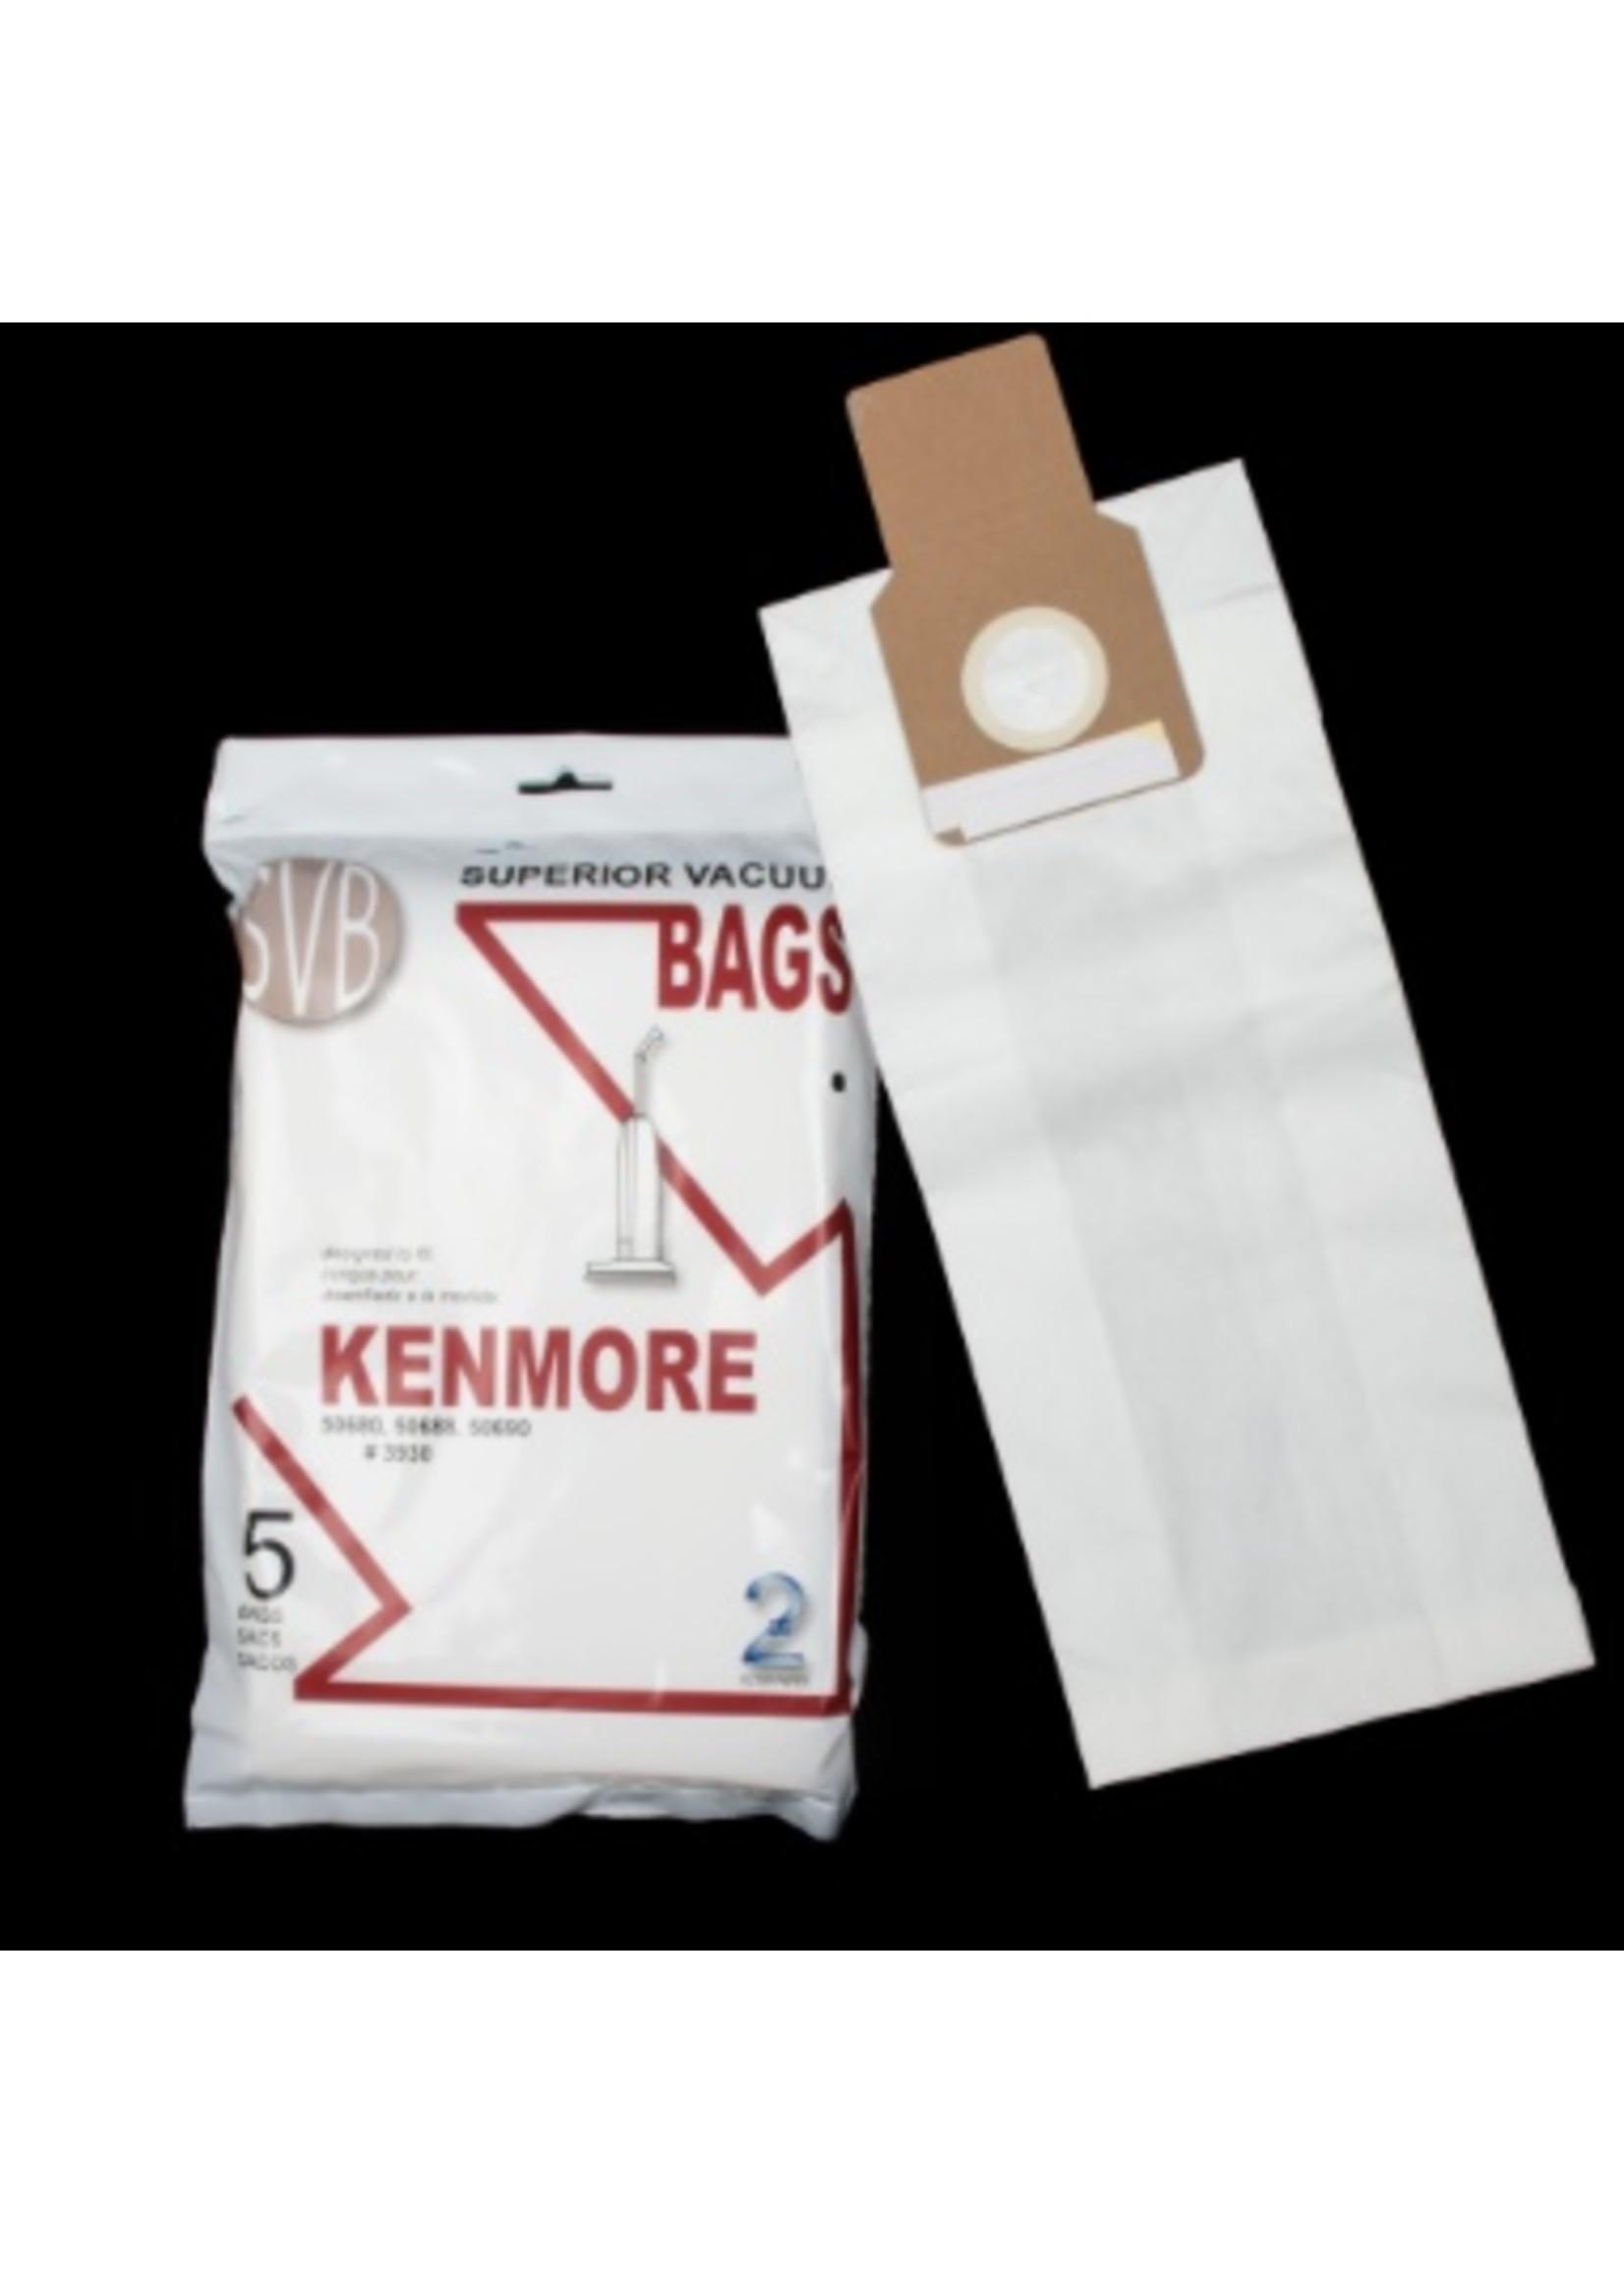 Kenmore Kenmore Upright Bags